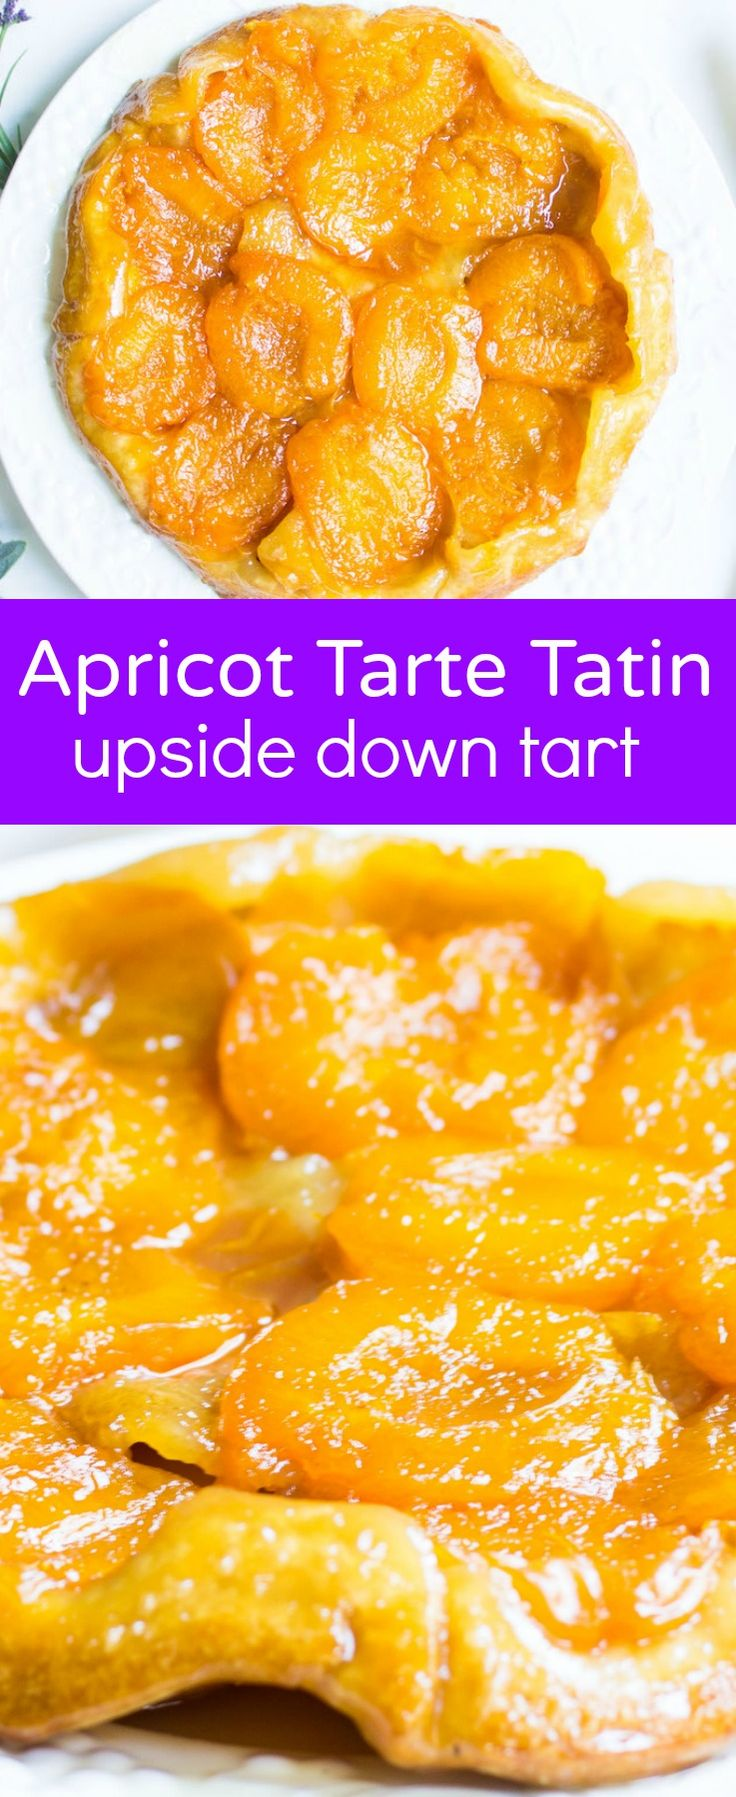 Best 25+ Apricot tart ideas on Pinterest | Apricot pie ...